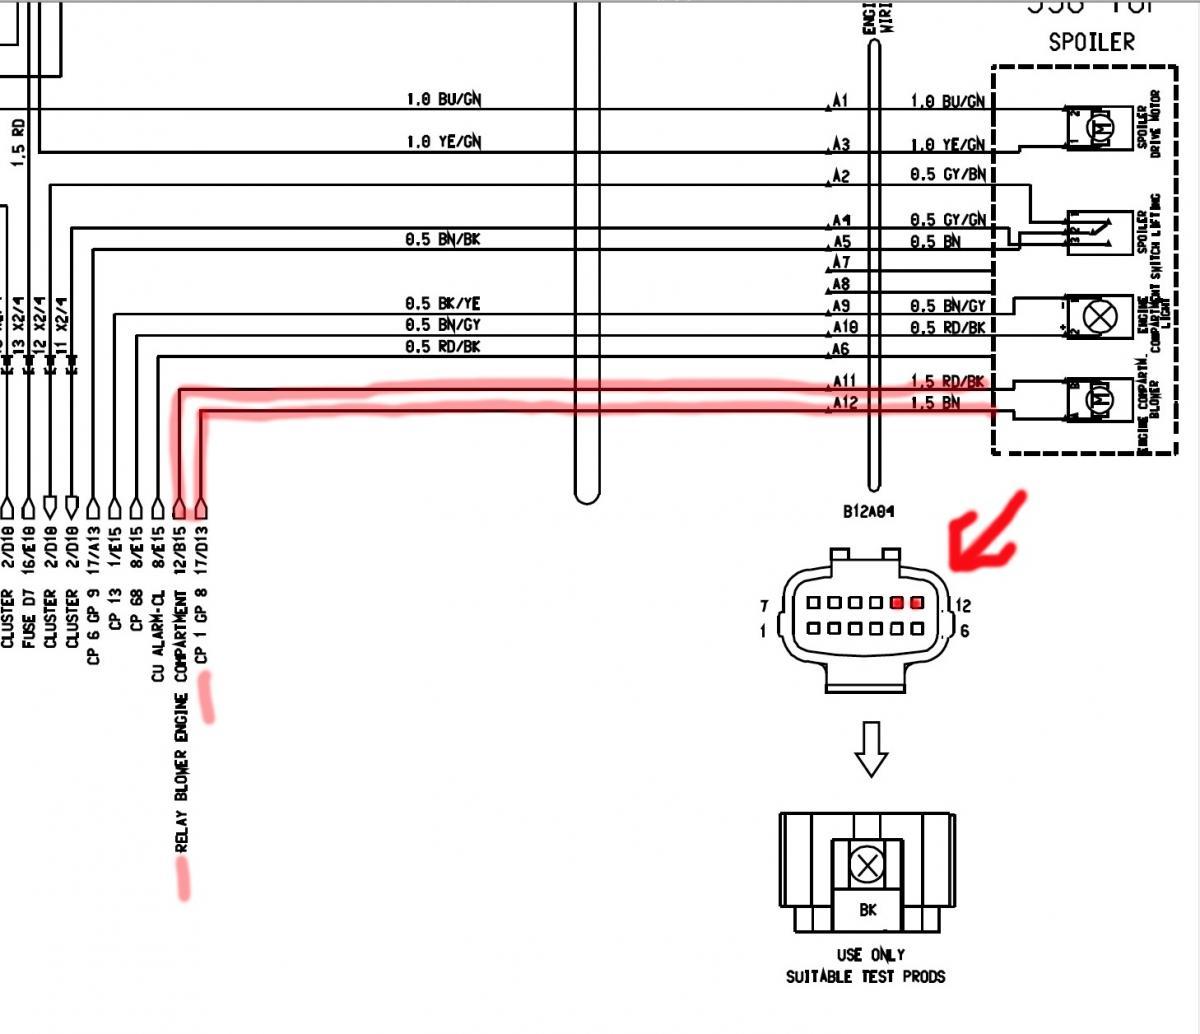 Porsche 996 Engine Code: P1675 Porsche Fault Code 658